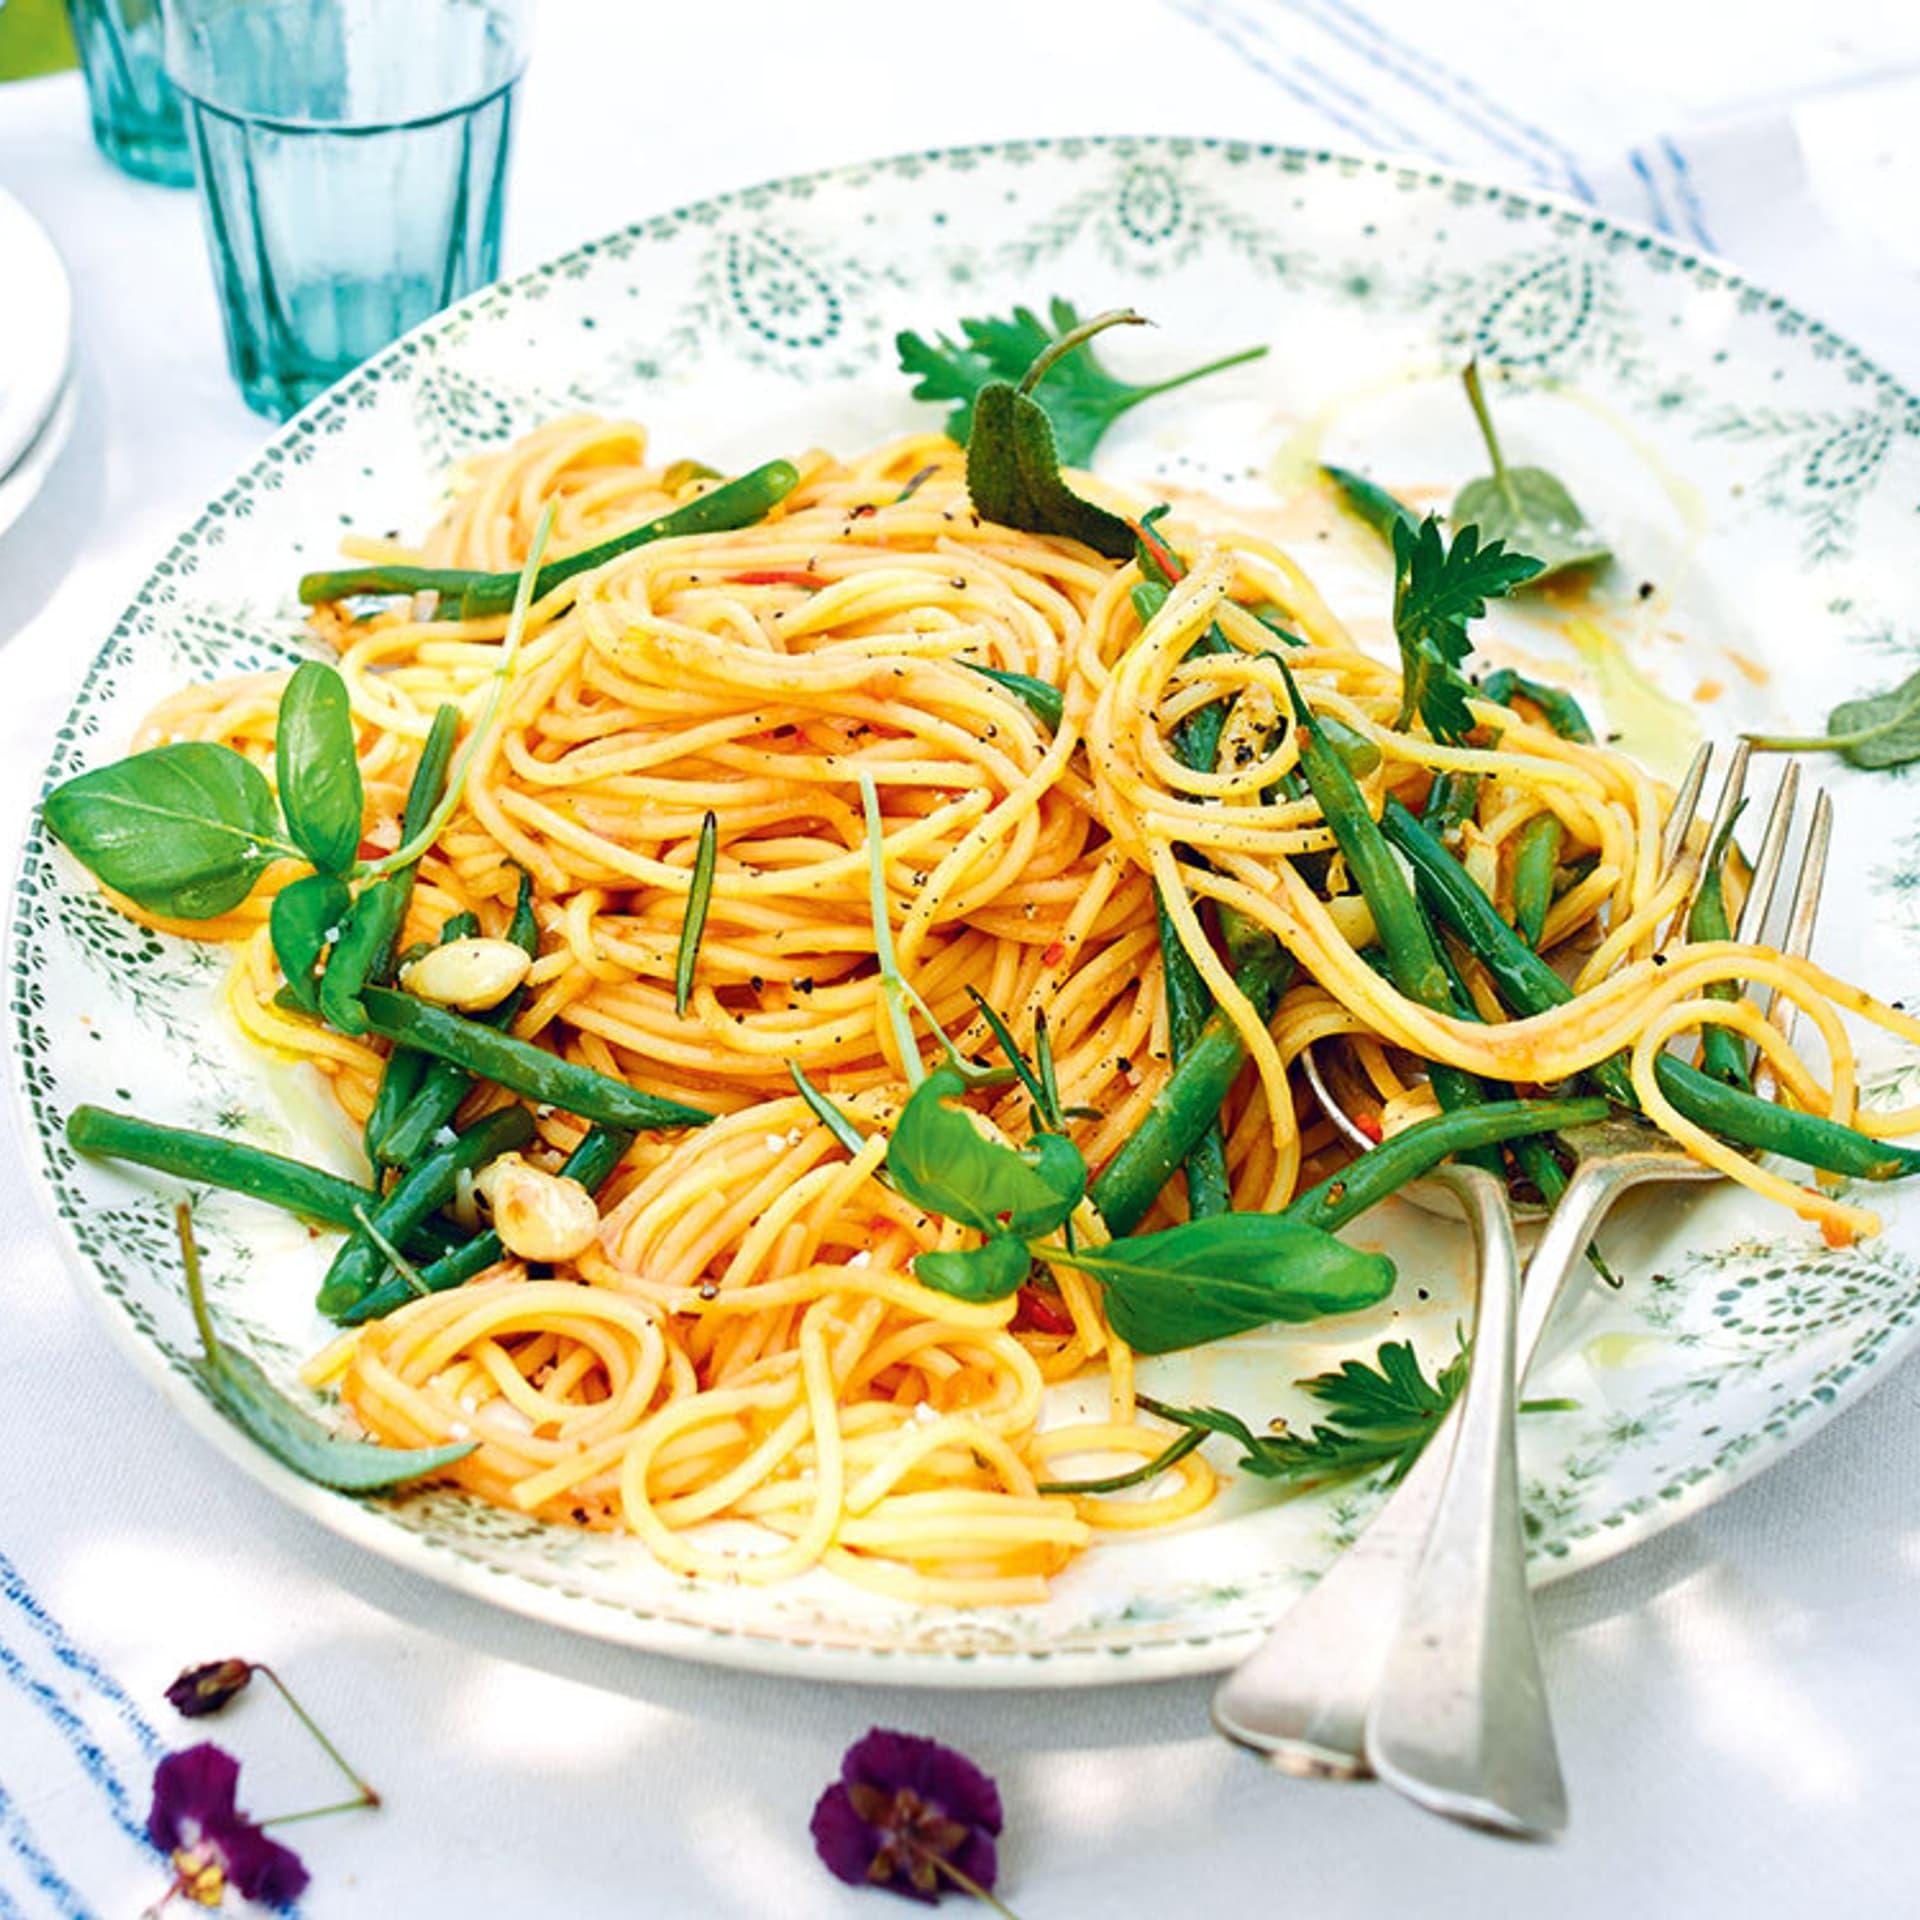 Spaghetti in Tomatensauce mit gruenen Bohnen